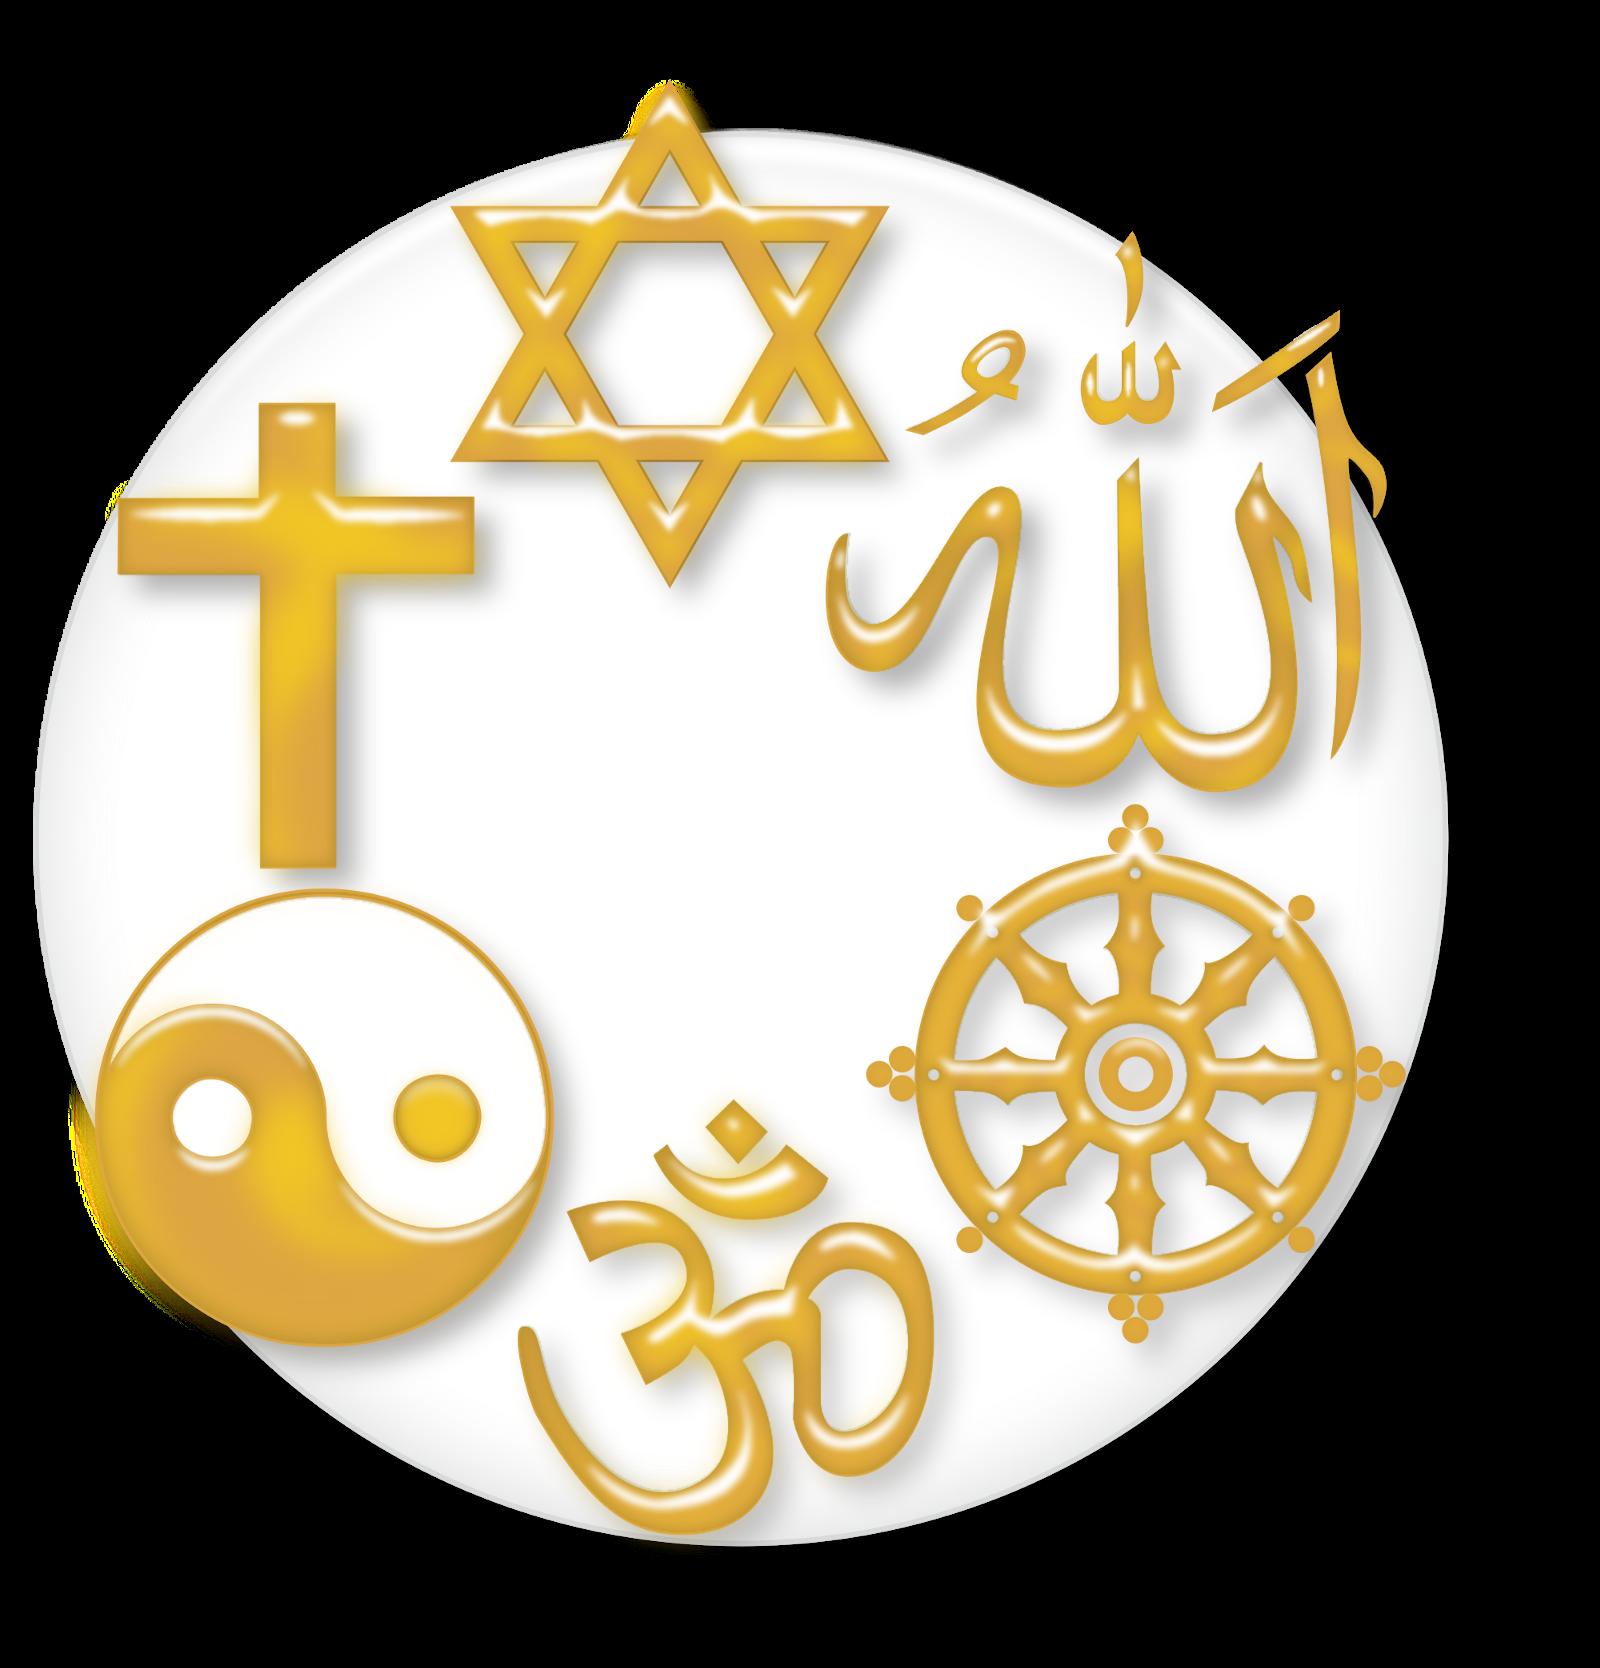 006 Cxkzl4phxwxmwztlh0fdq Essay Example Is There One True Unique Religion Full